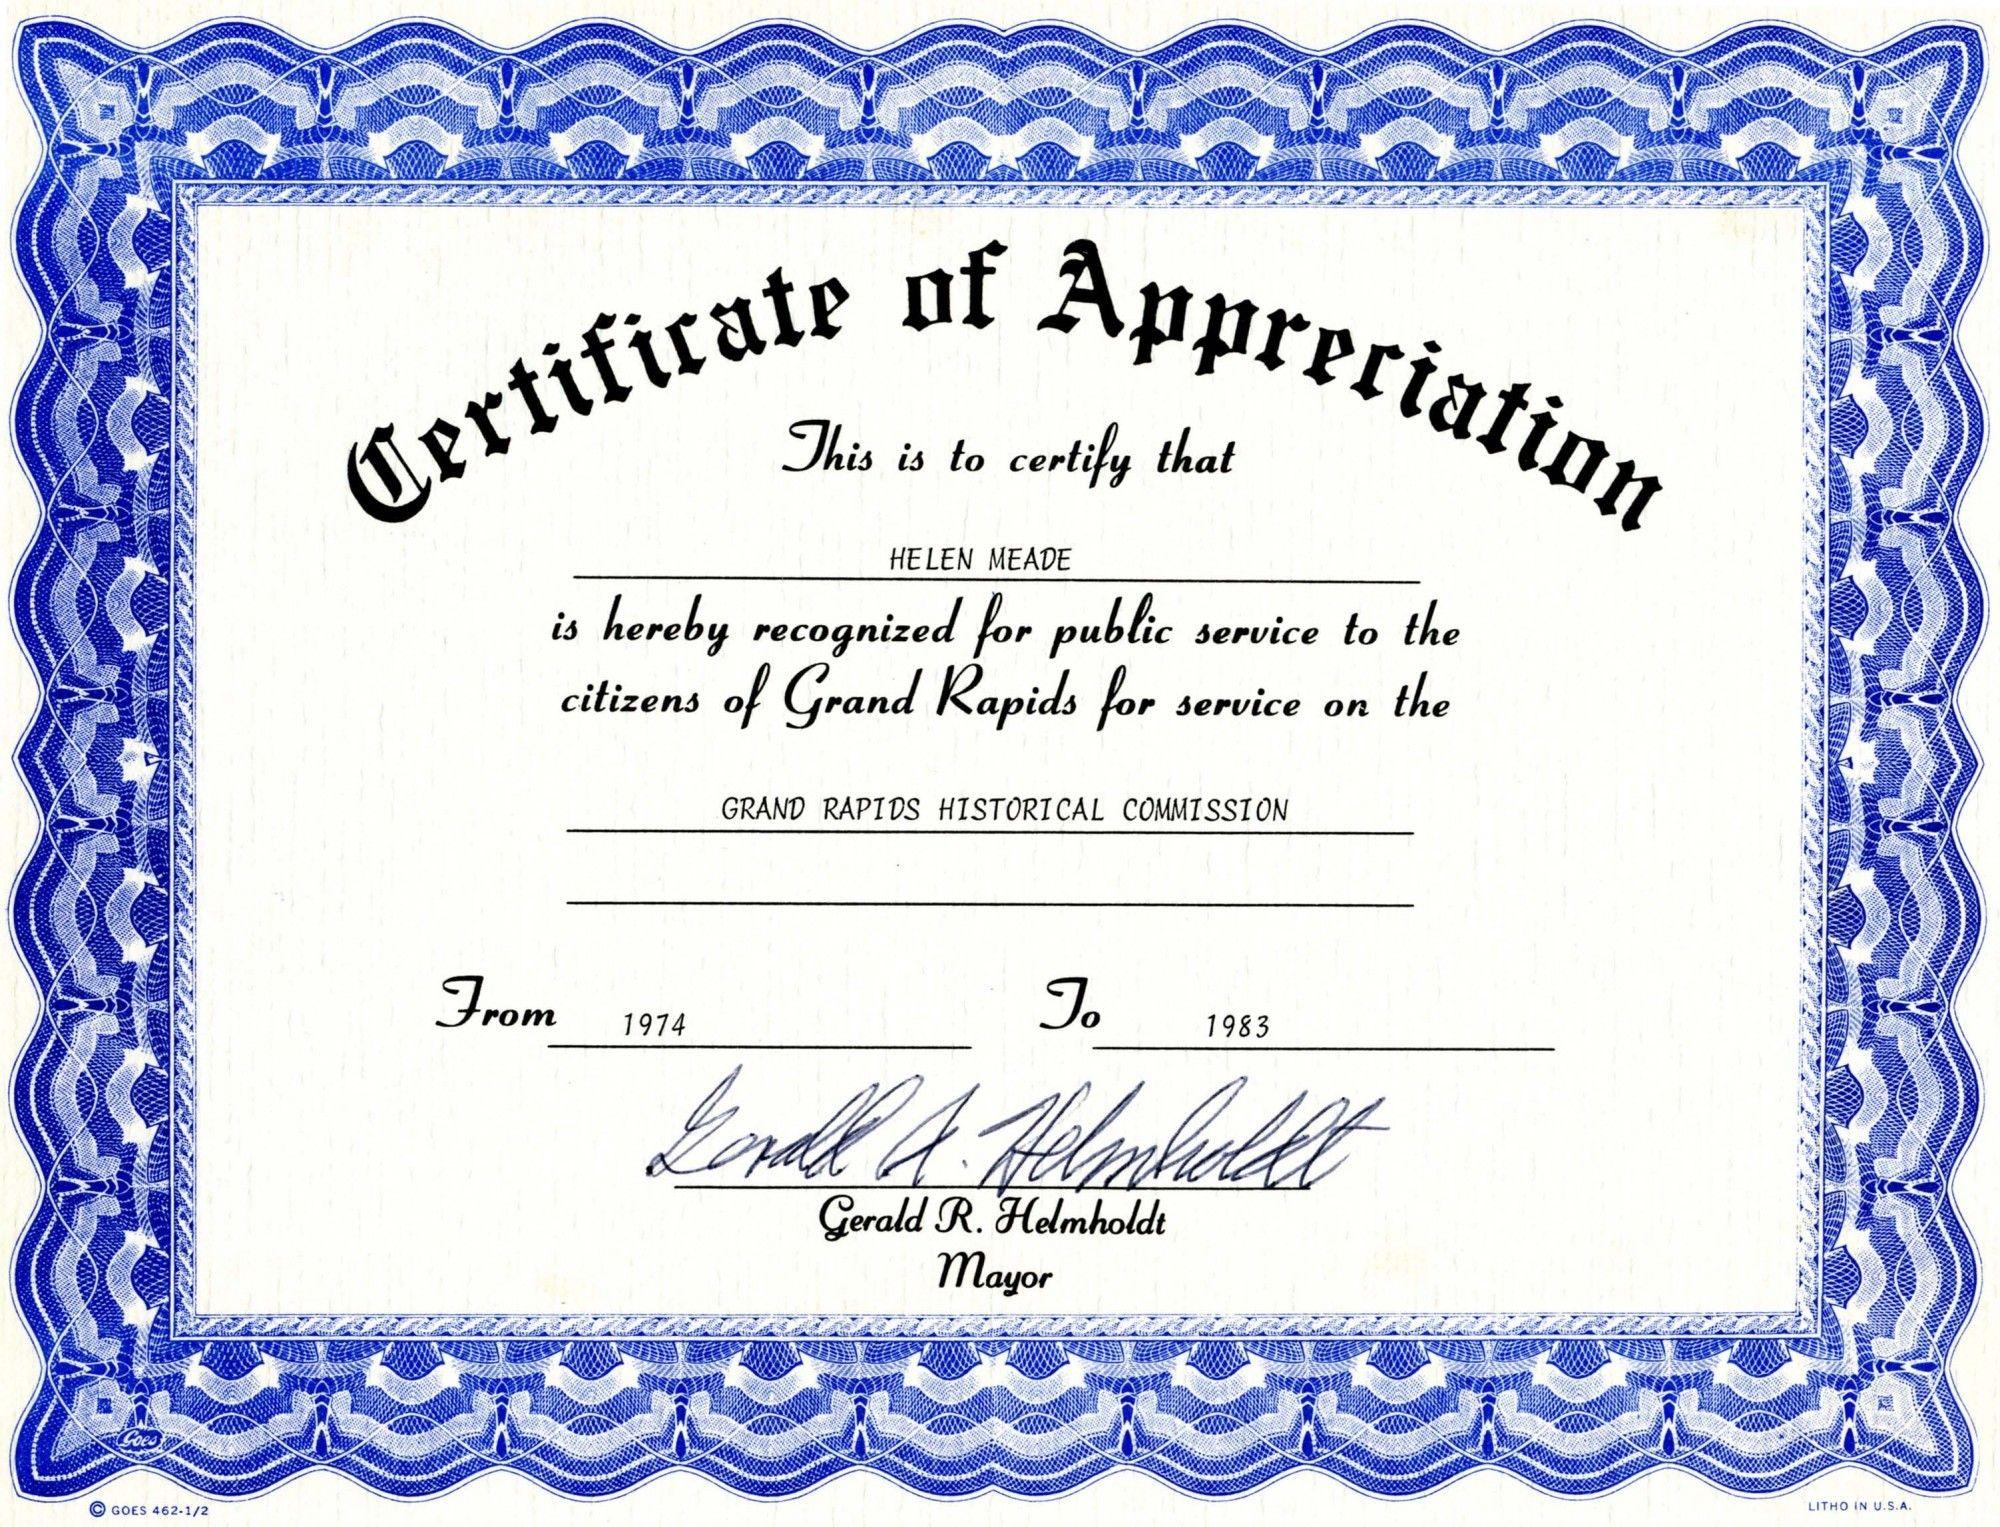 Appreciation Certificate Templates Free Download With Regard To Blank Certificate Templates Free Download